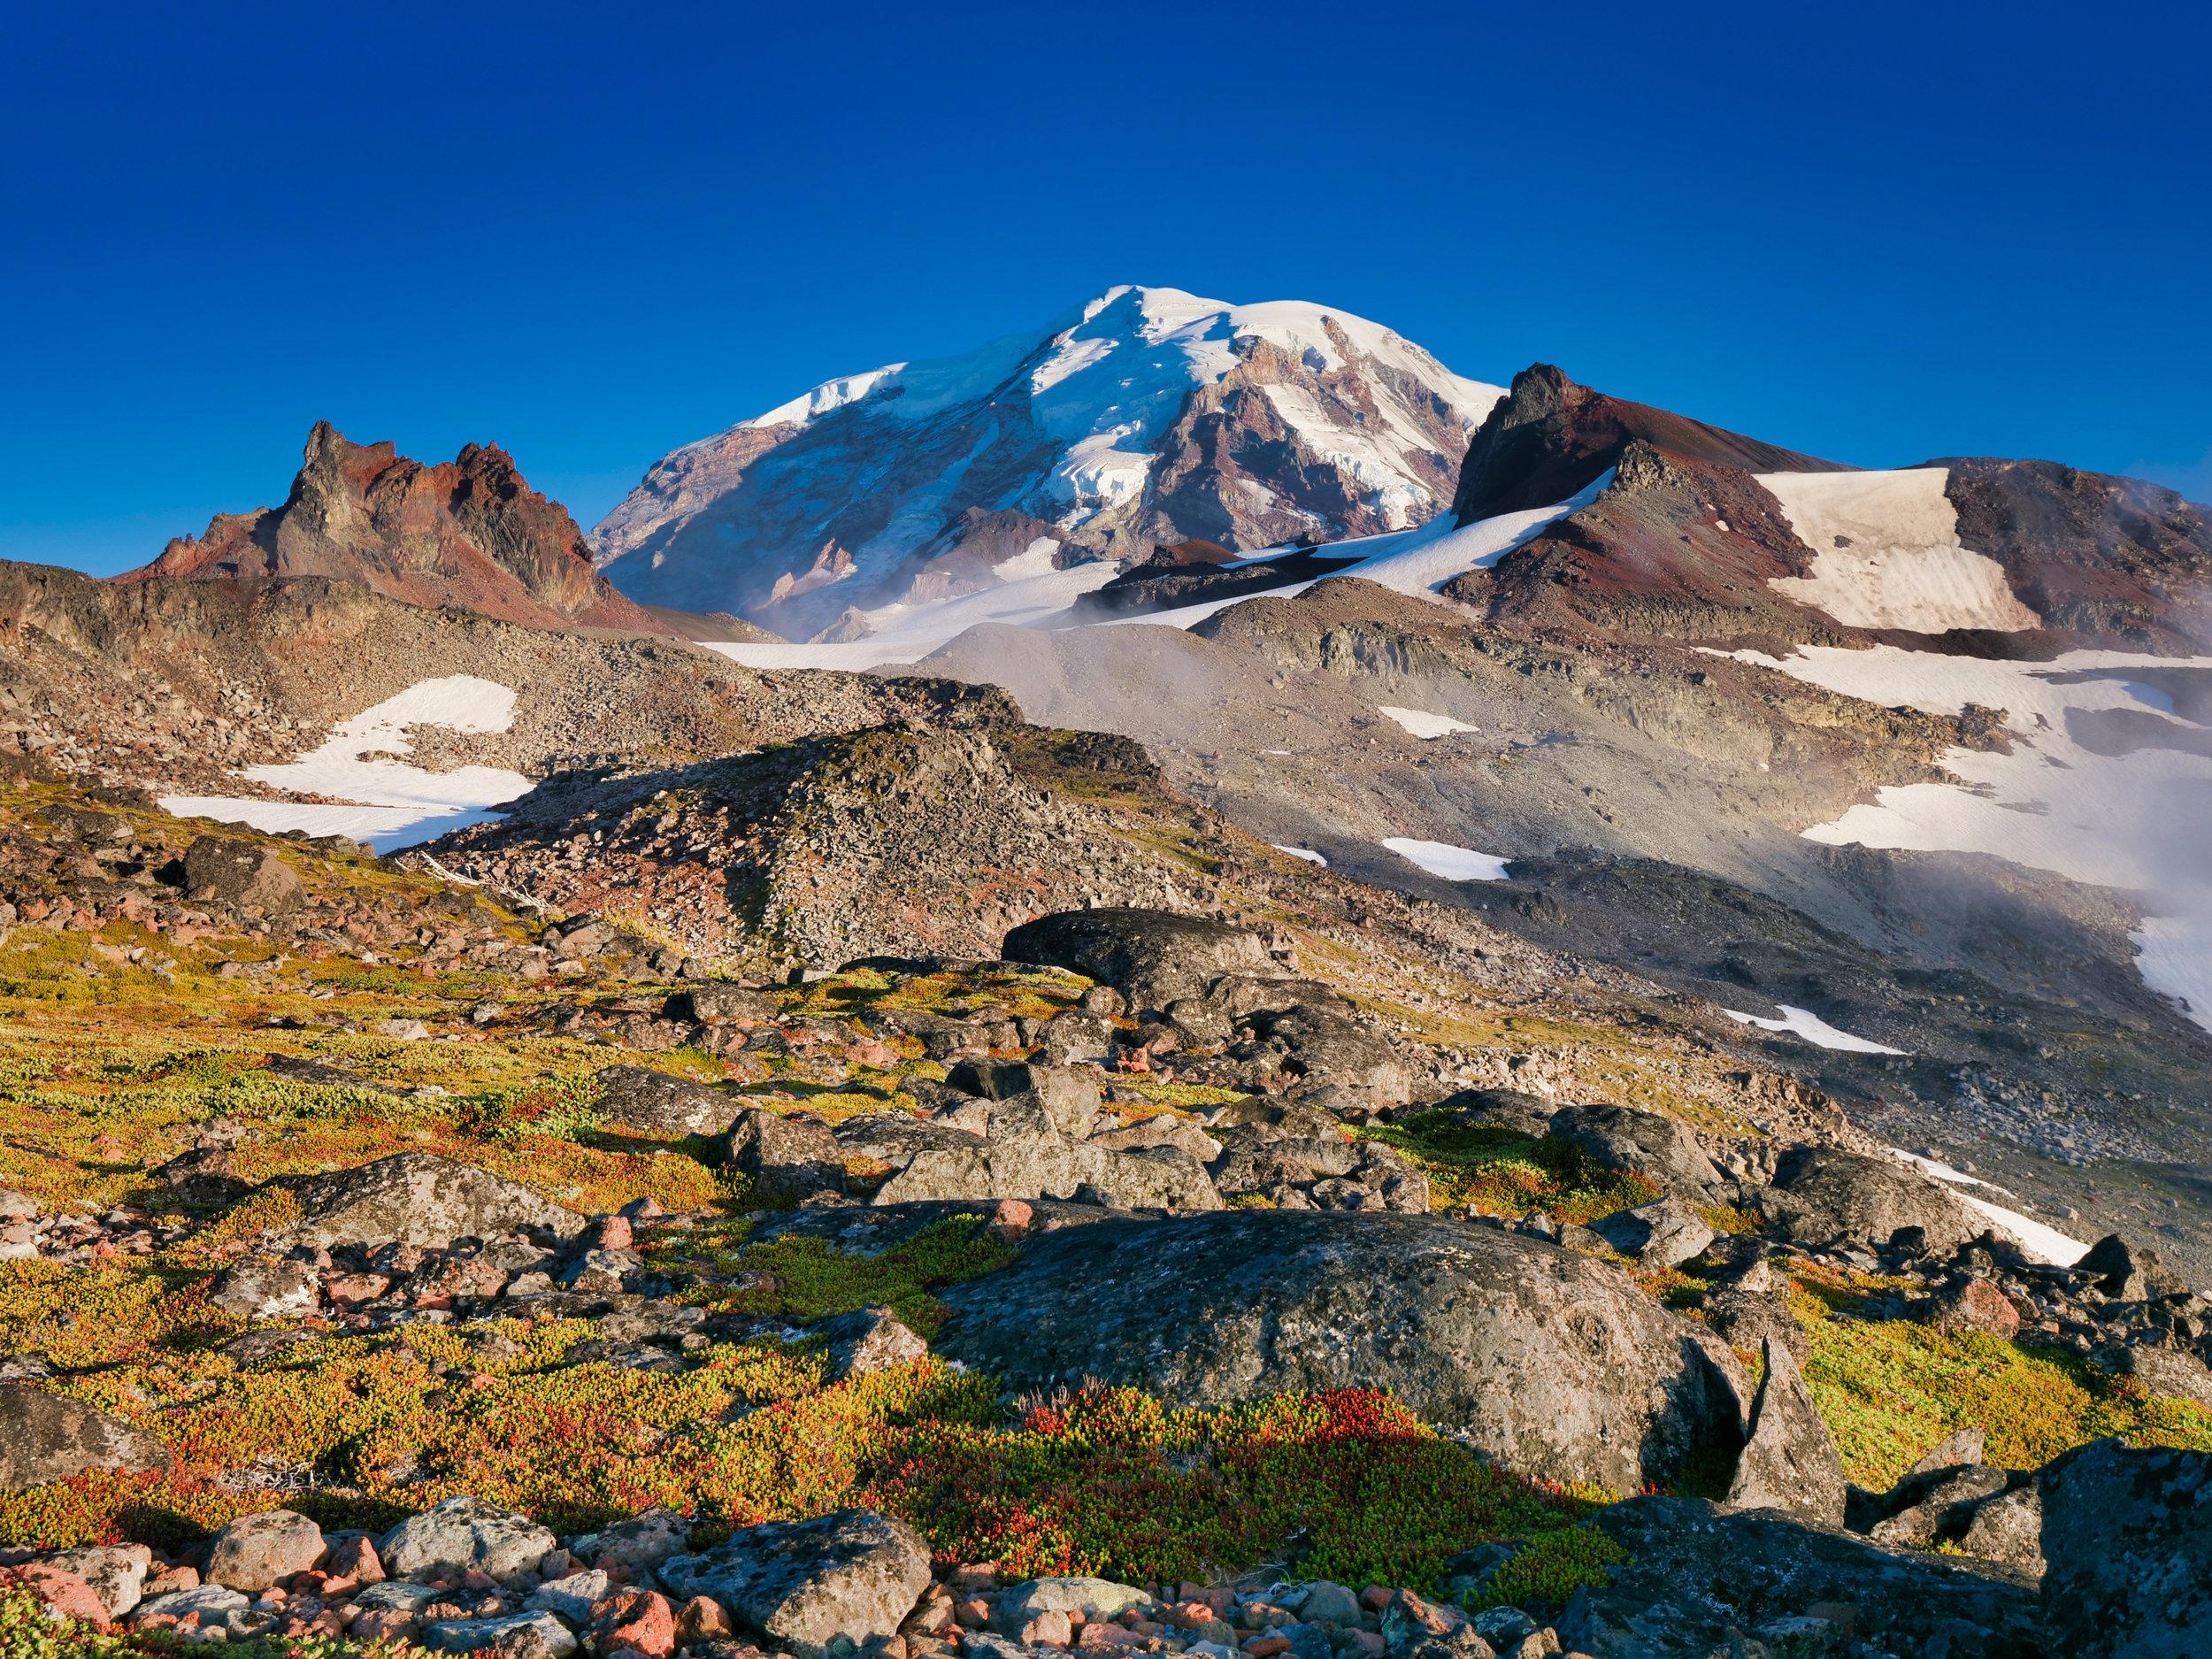 Image taken with Panasonic G9 with Leica 8-18 lens (Ptarmigan Ridge, Mt. Rainier)